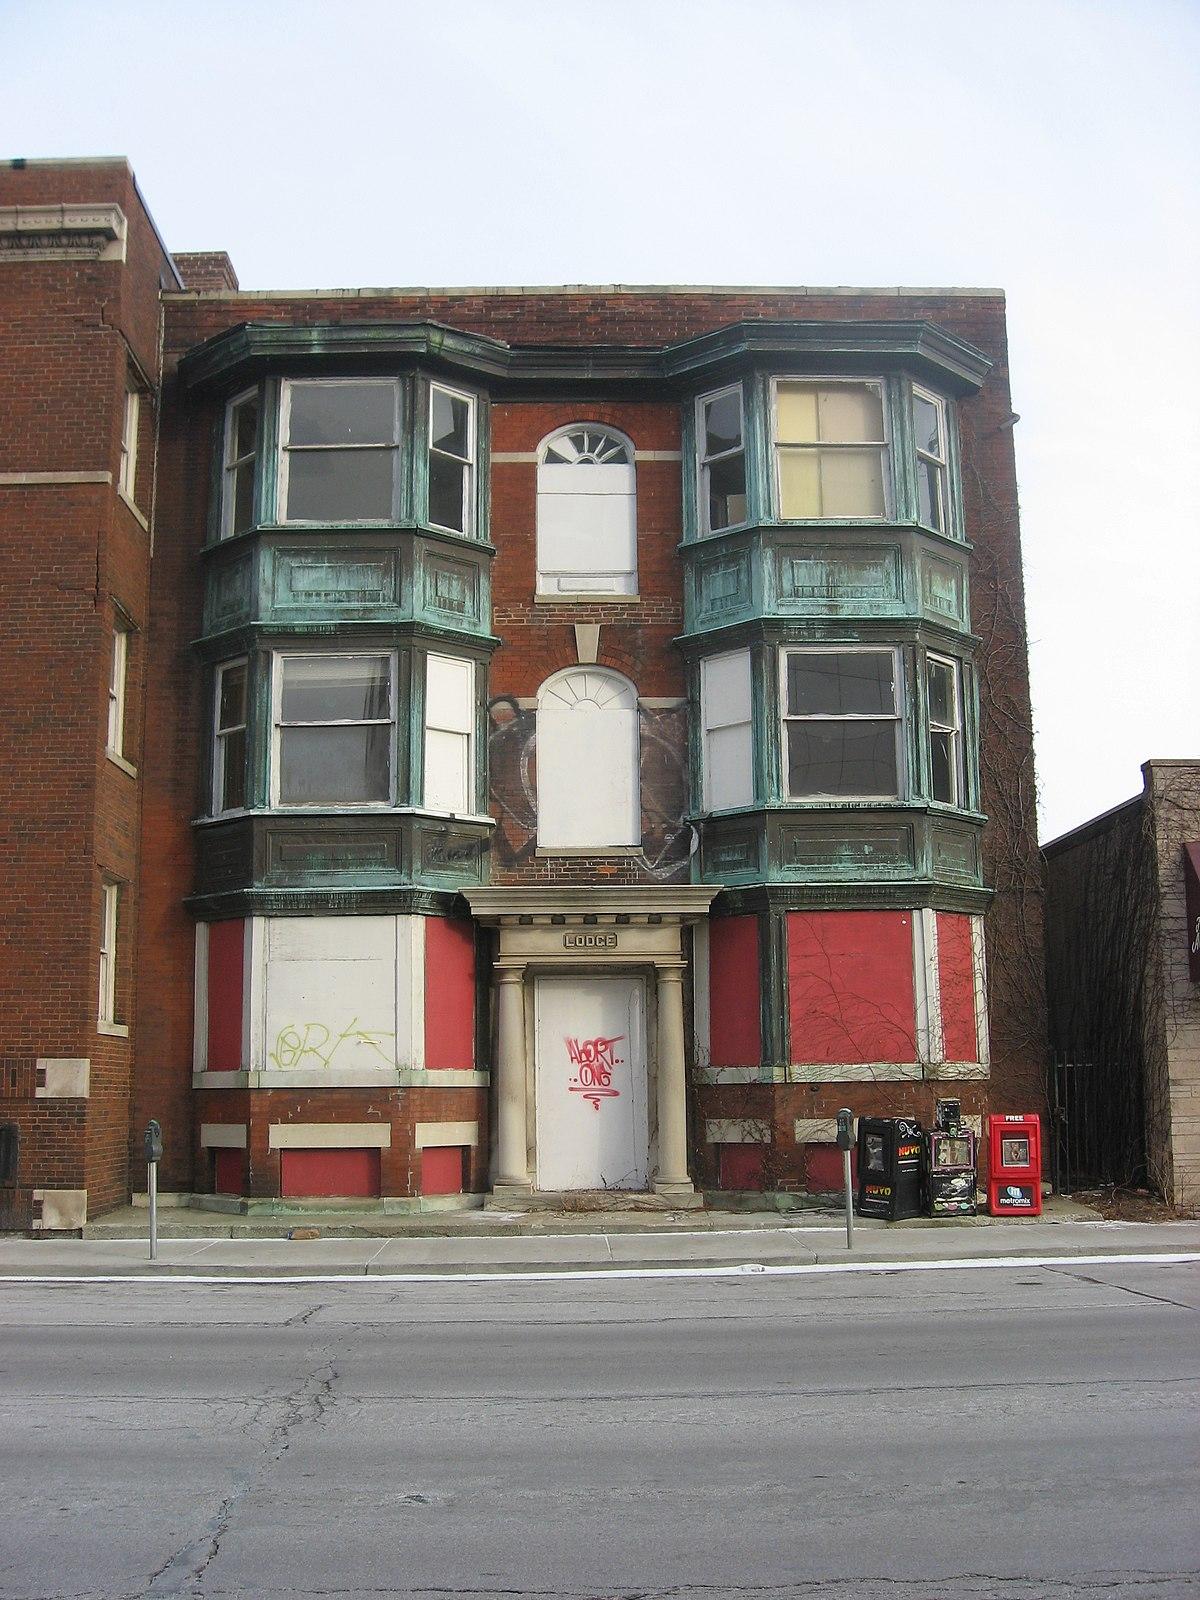 The Indiana Insider Blog: The Lodge (Indianapolis, Indiana)